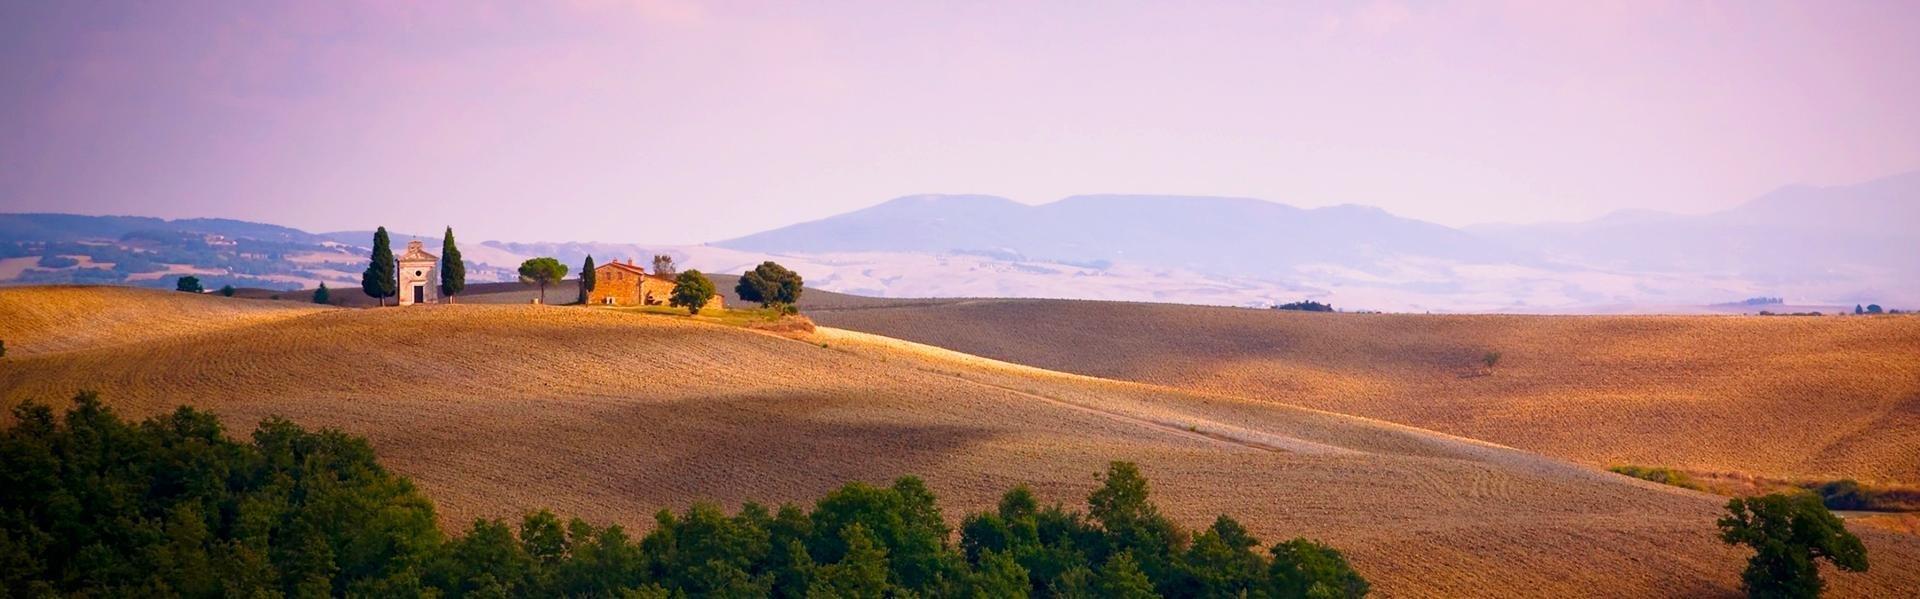 Toscane, Italië